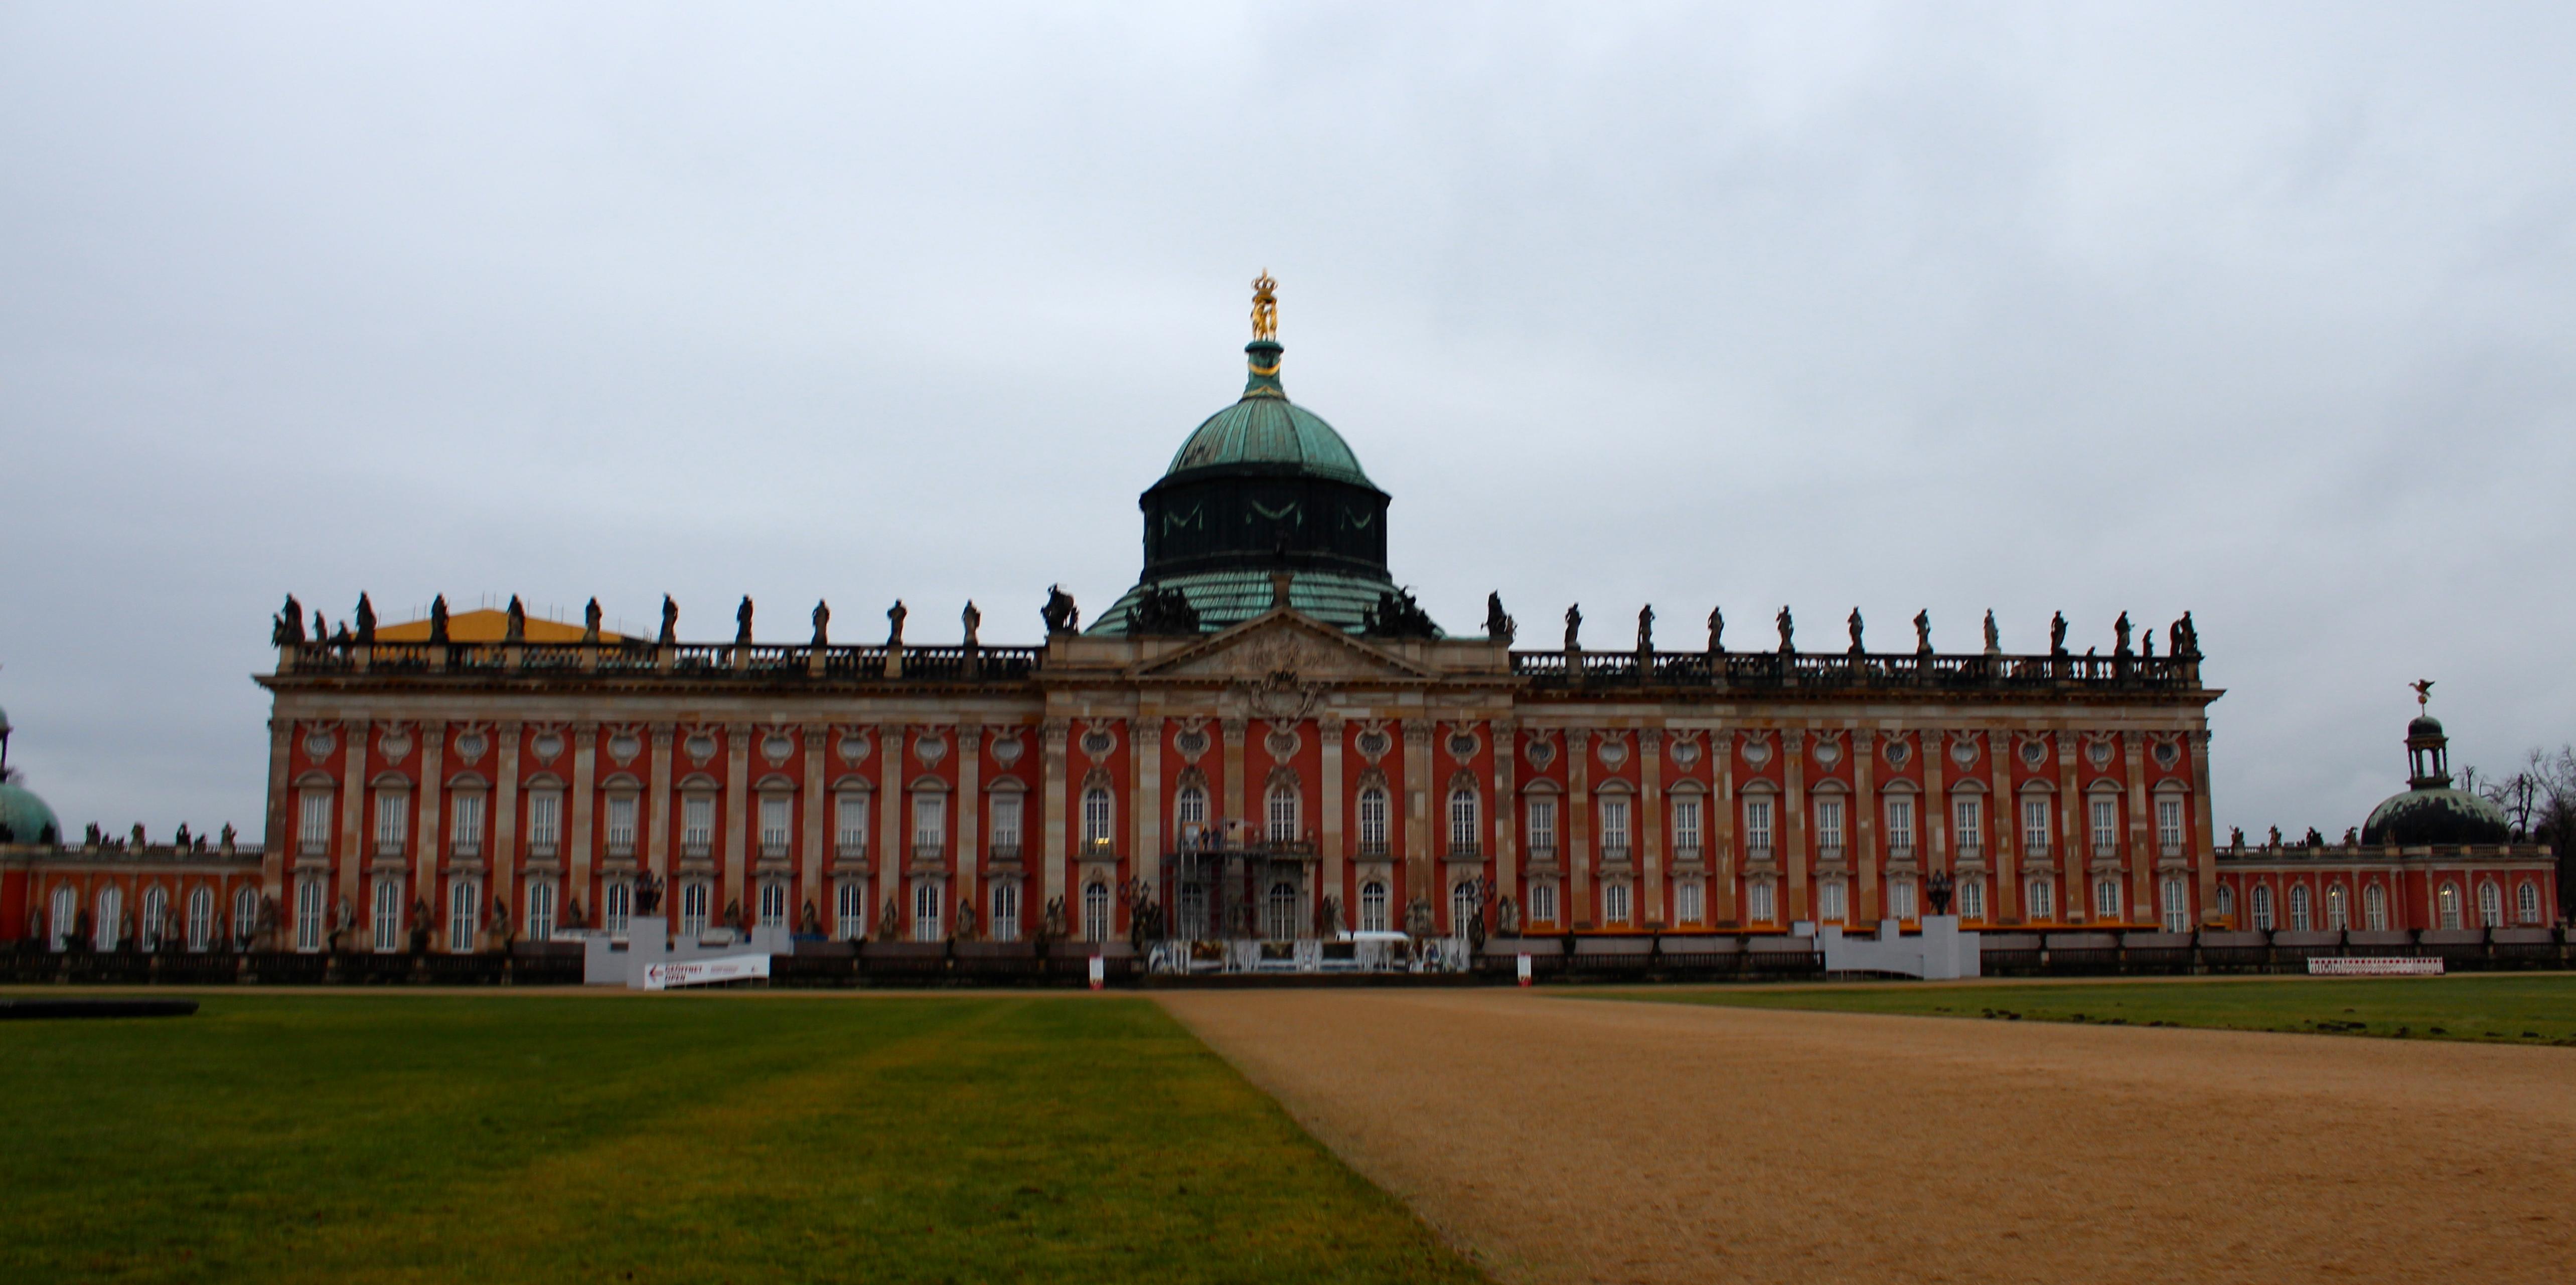 Neues Palais New Palace Potsdam Germany Prussia S Last